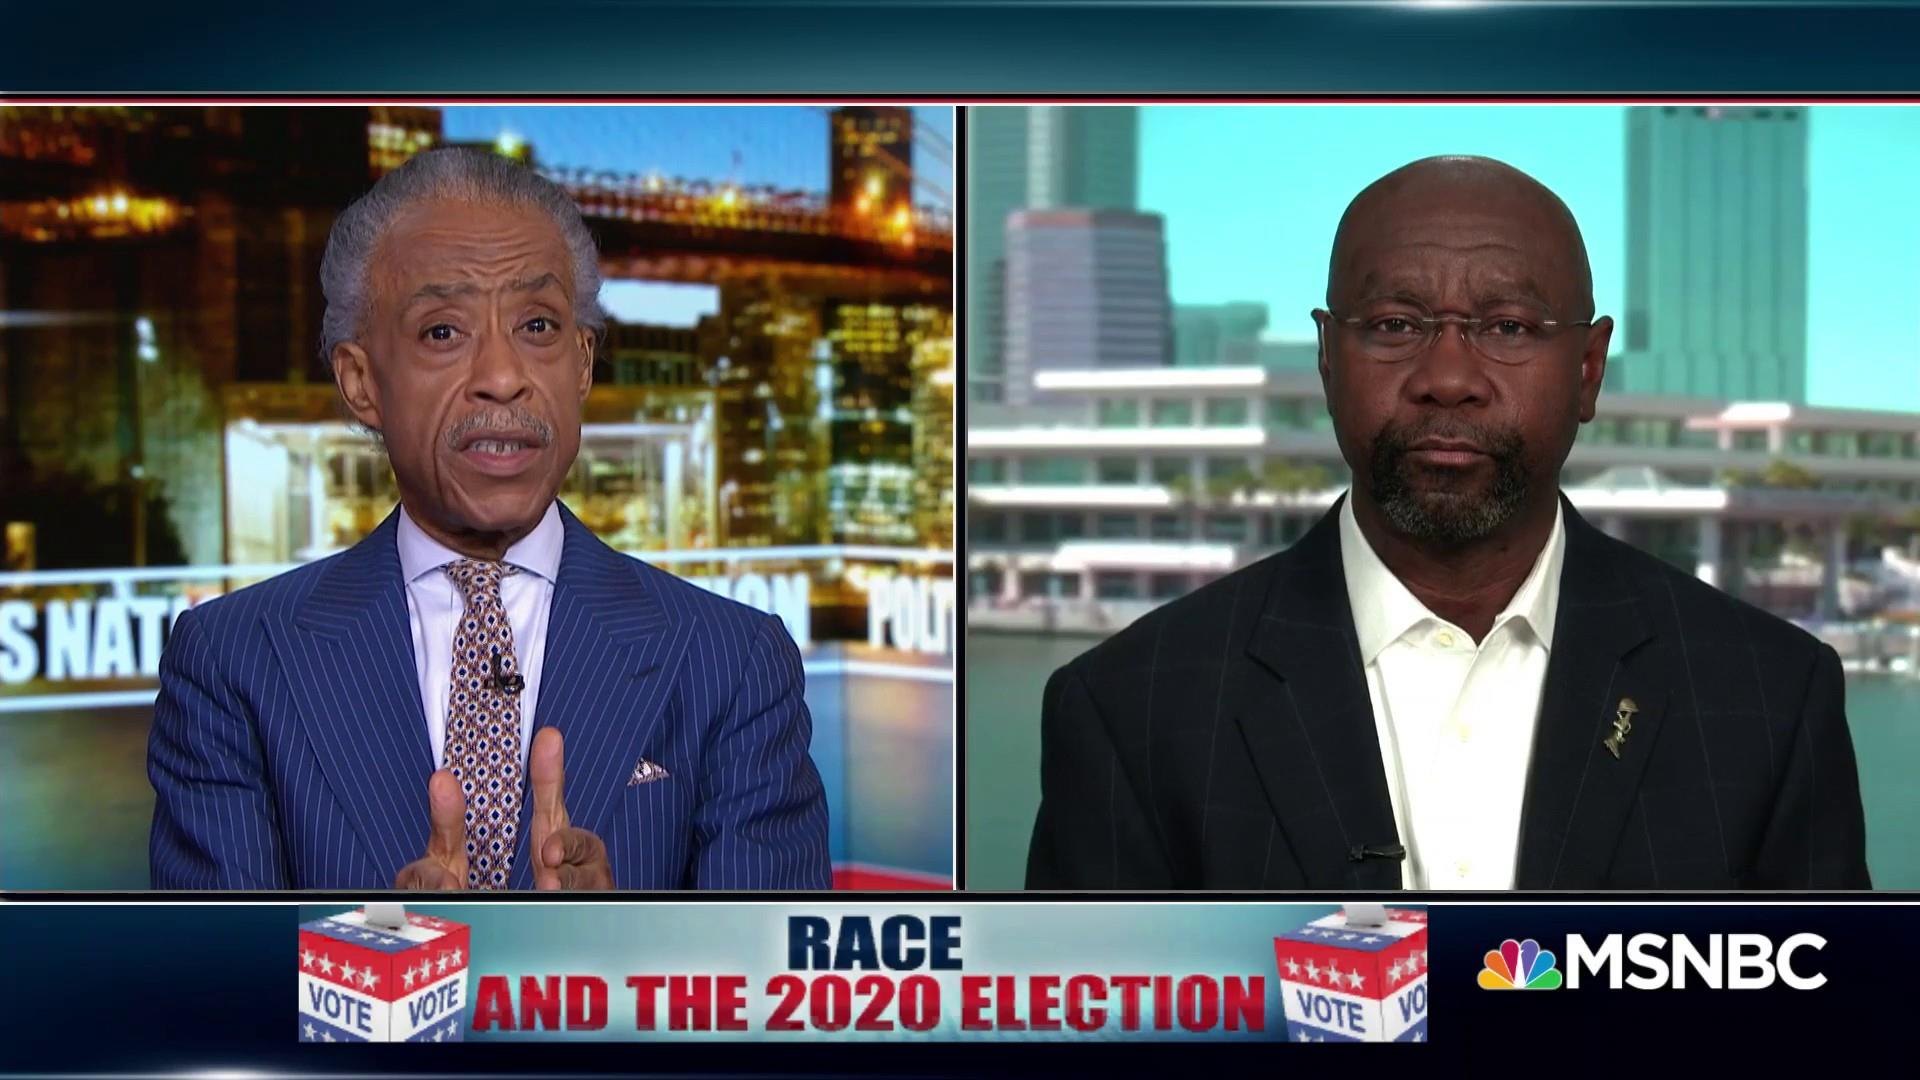 MT Mayor Collins running for US Senate, speaks on racist attack